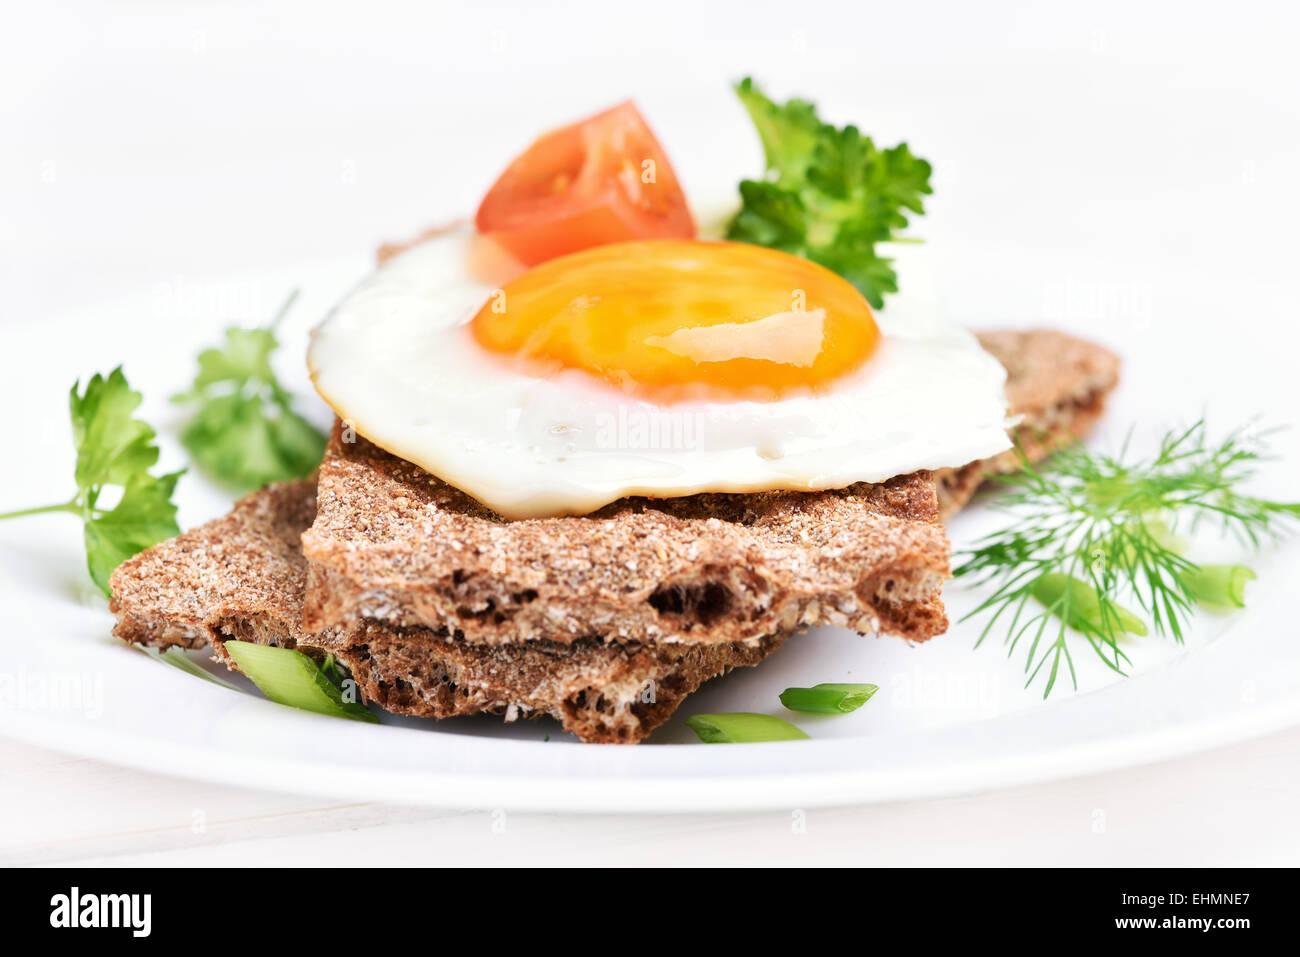 Breakfast fried egg on crispbread, close up view - Stock Image